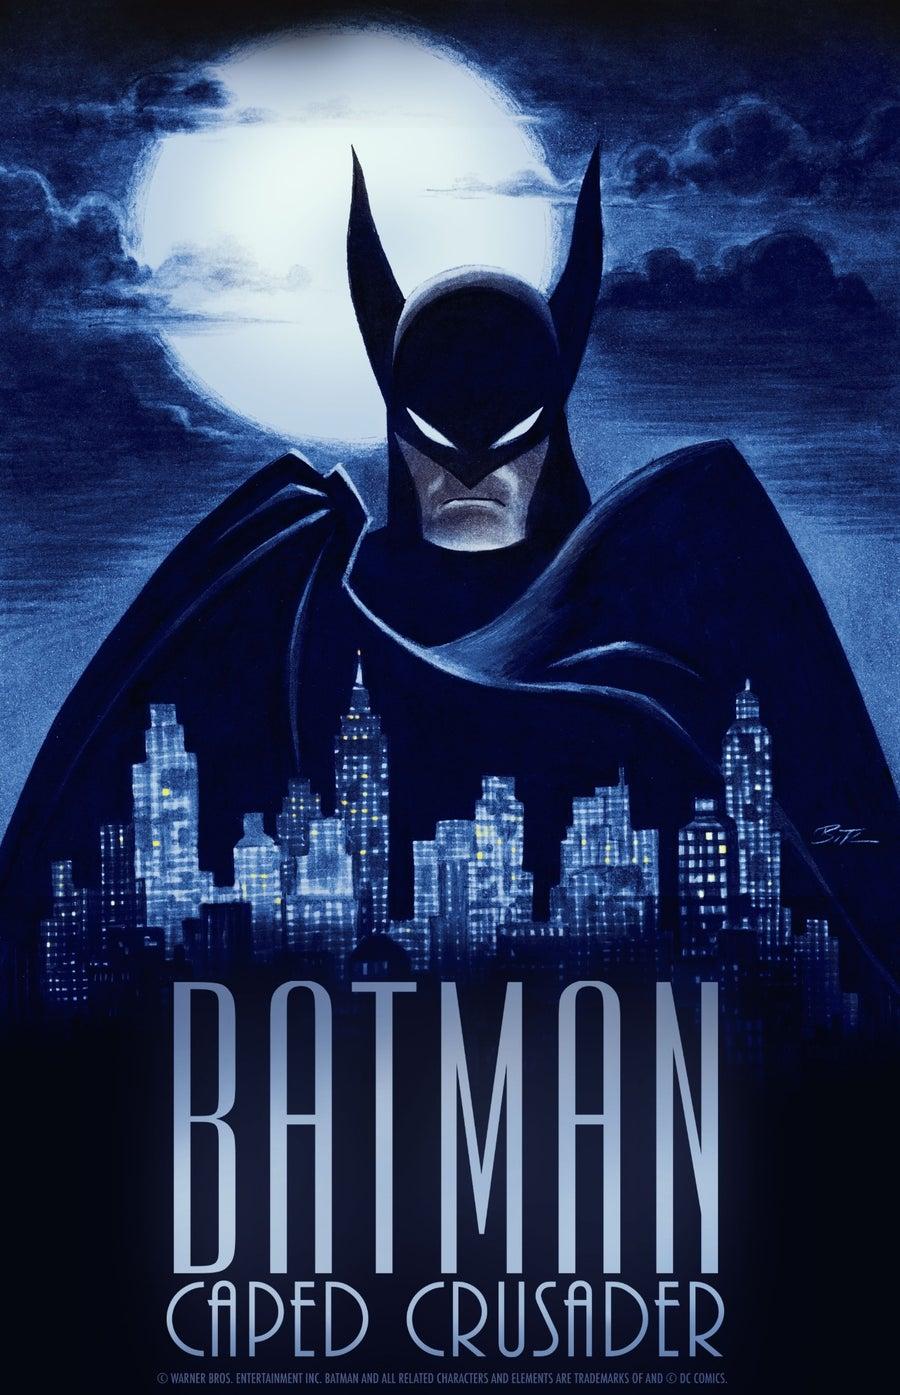 Batman: Caped Crusader poster